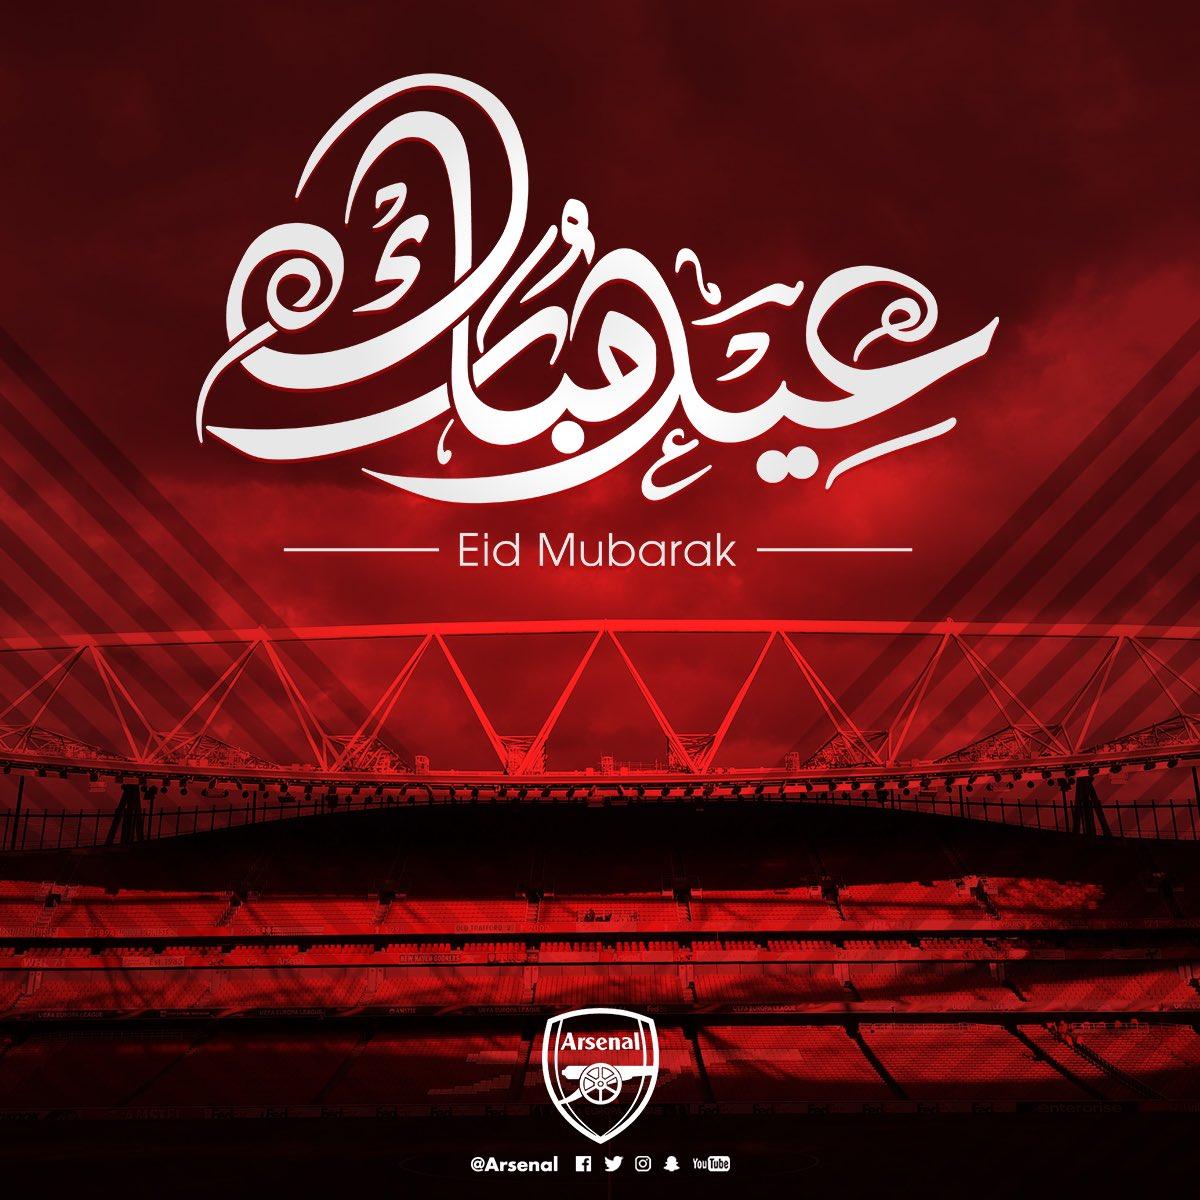 Eid Mubarak to everyone celebrating around the world, from all of us here at Arsenal 😃 #EidMubarak